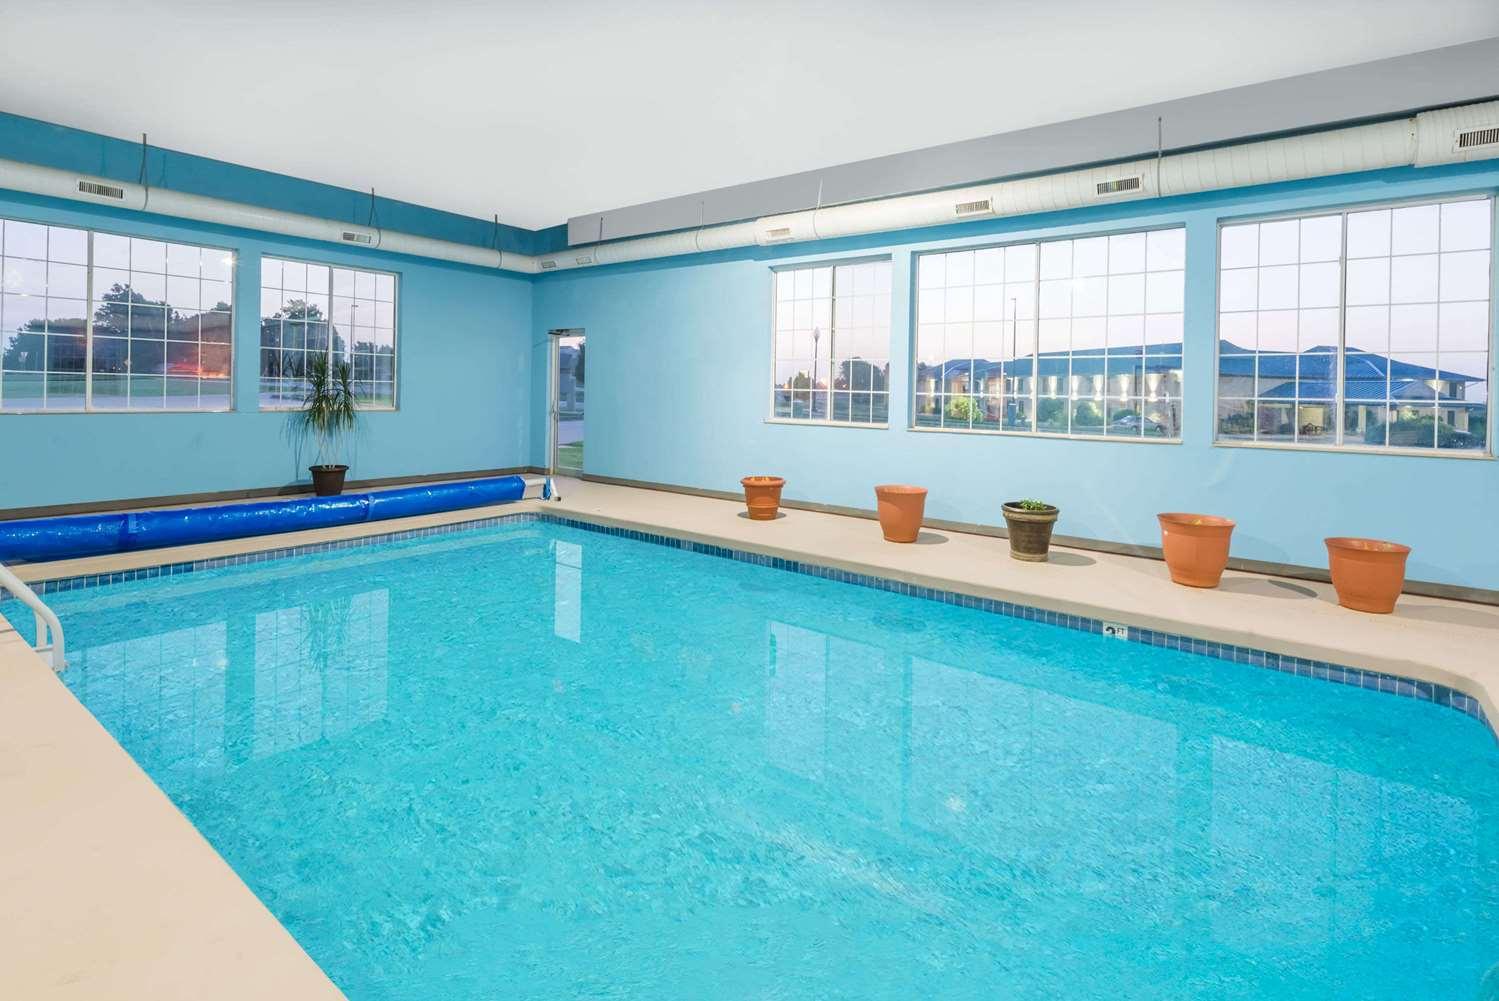 Pool Super 8 Hotel Winfield